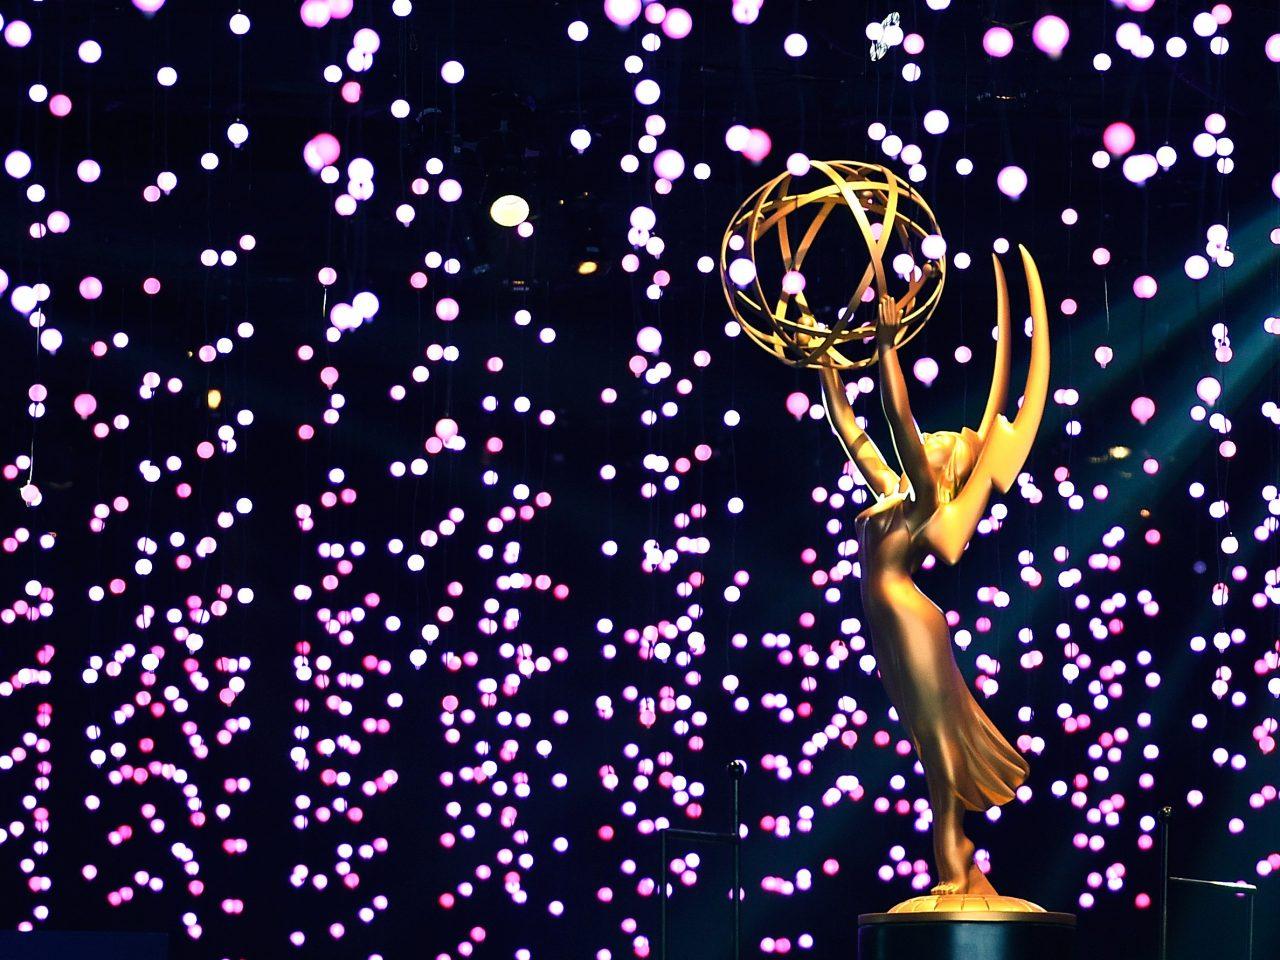 EmmyAwards-1032319276-1280x960.jpg